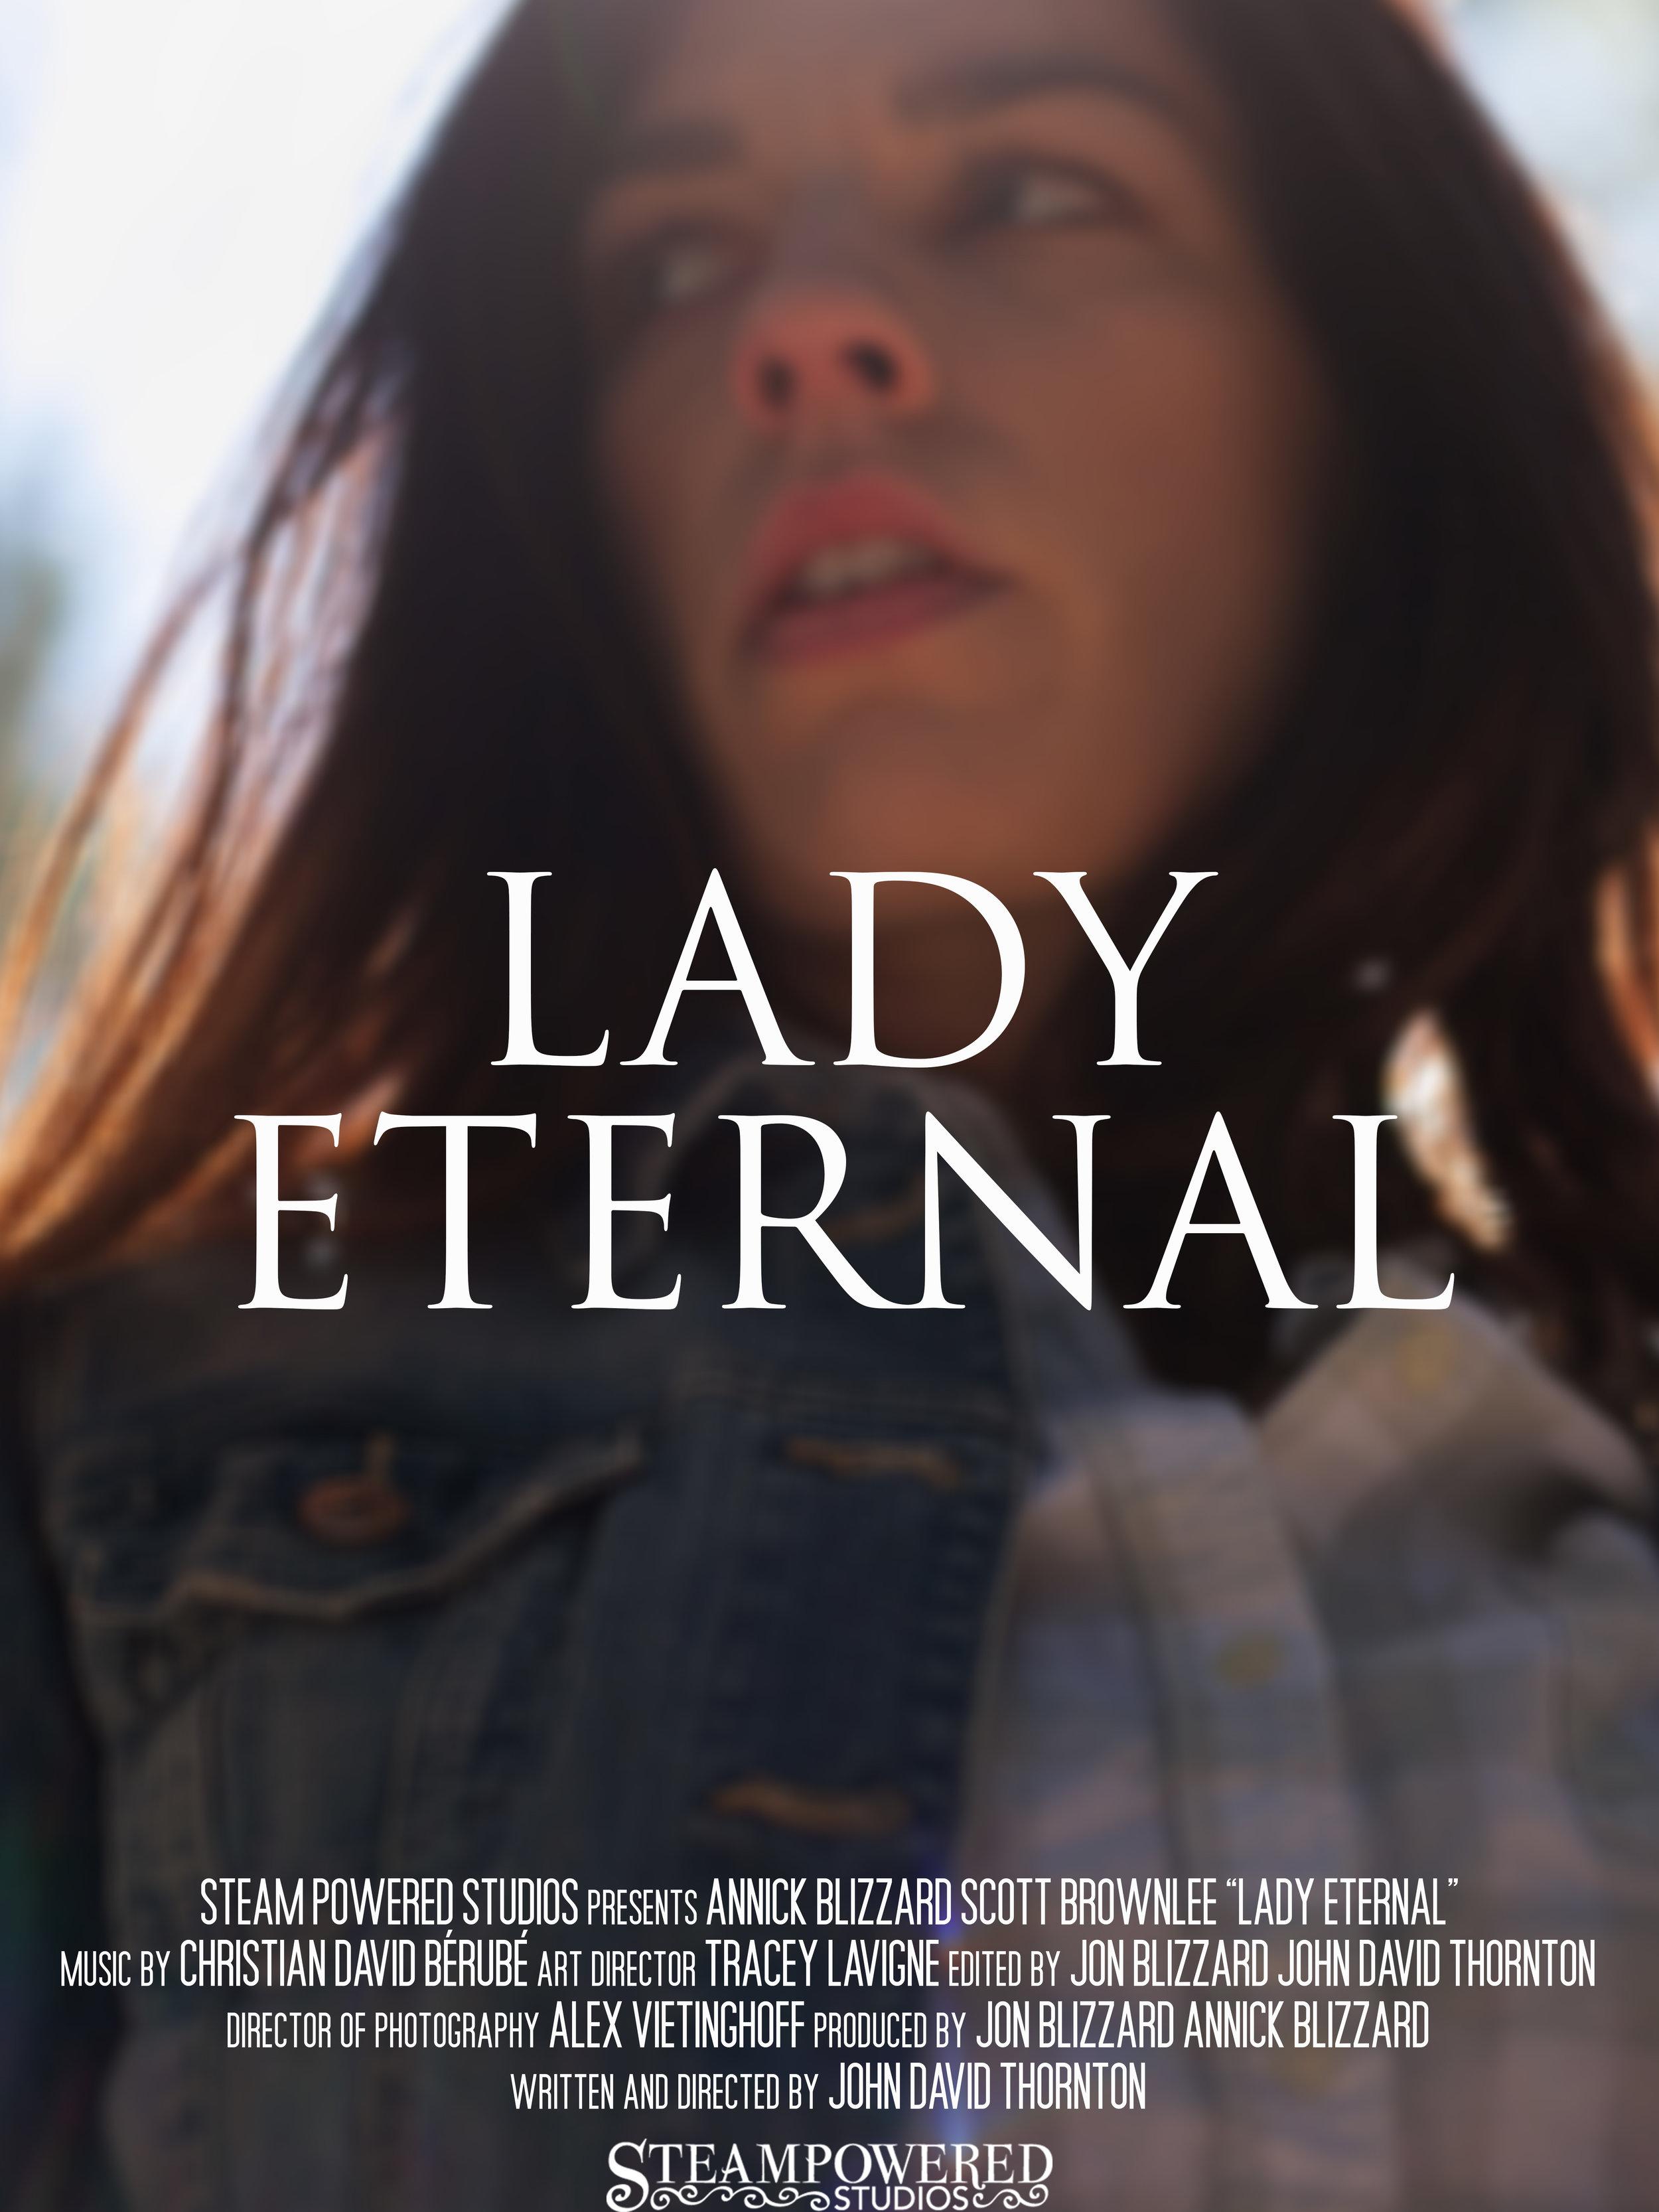 Lady Eternal, 2016 - Short Film